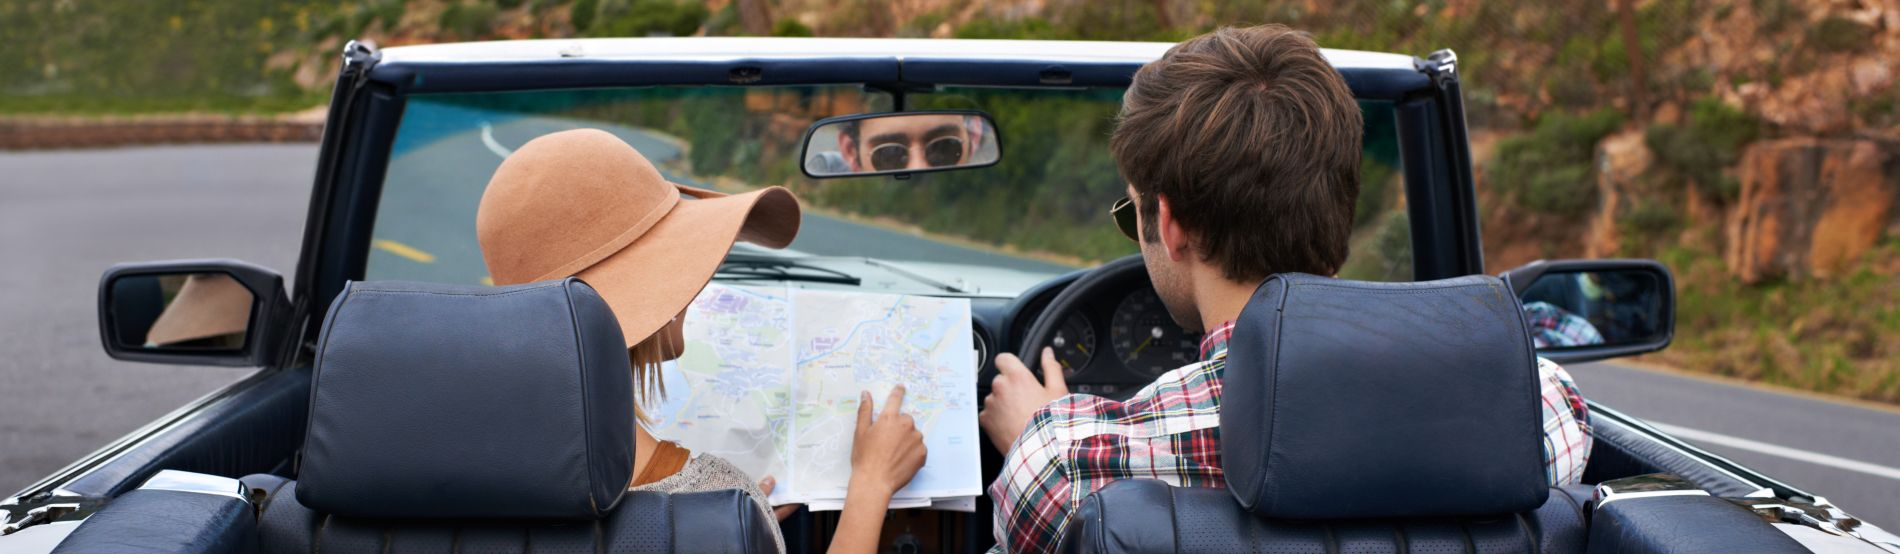 Couple on a road trip deciding where to go next